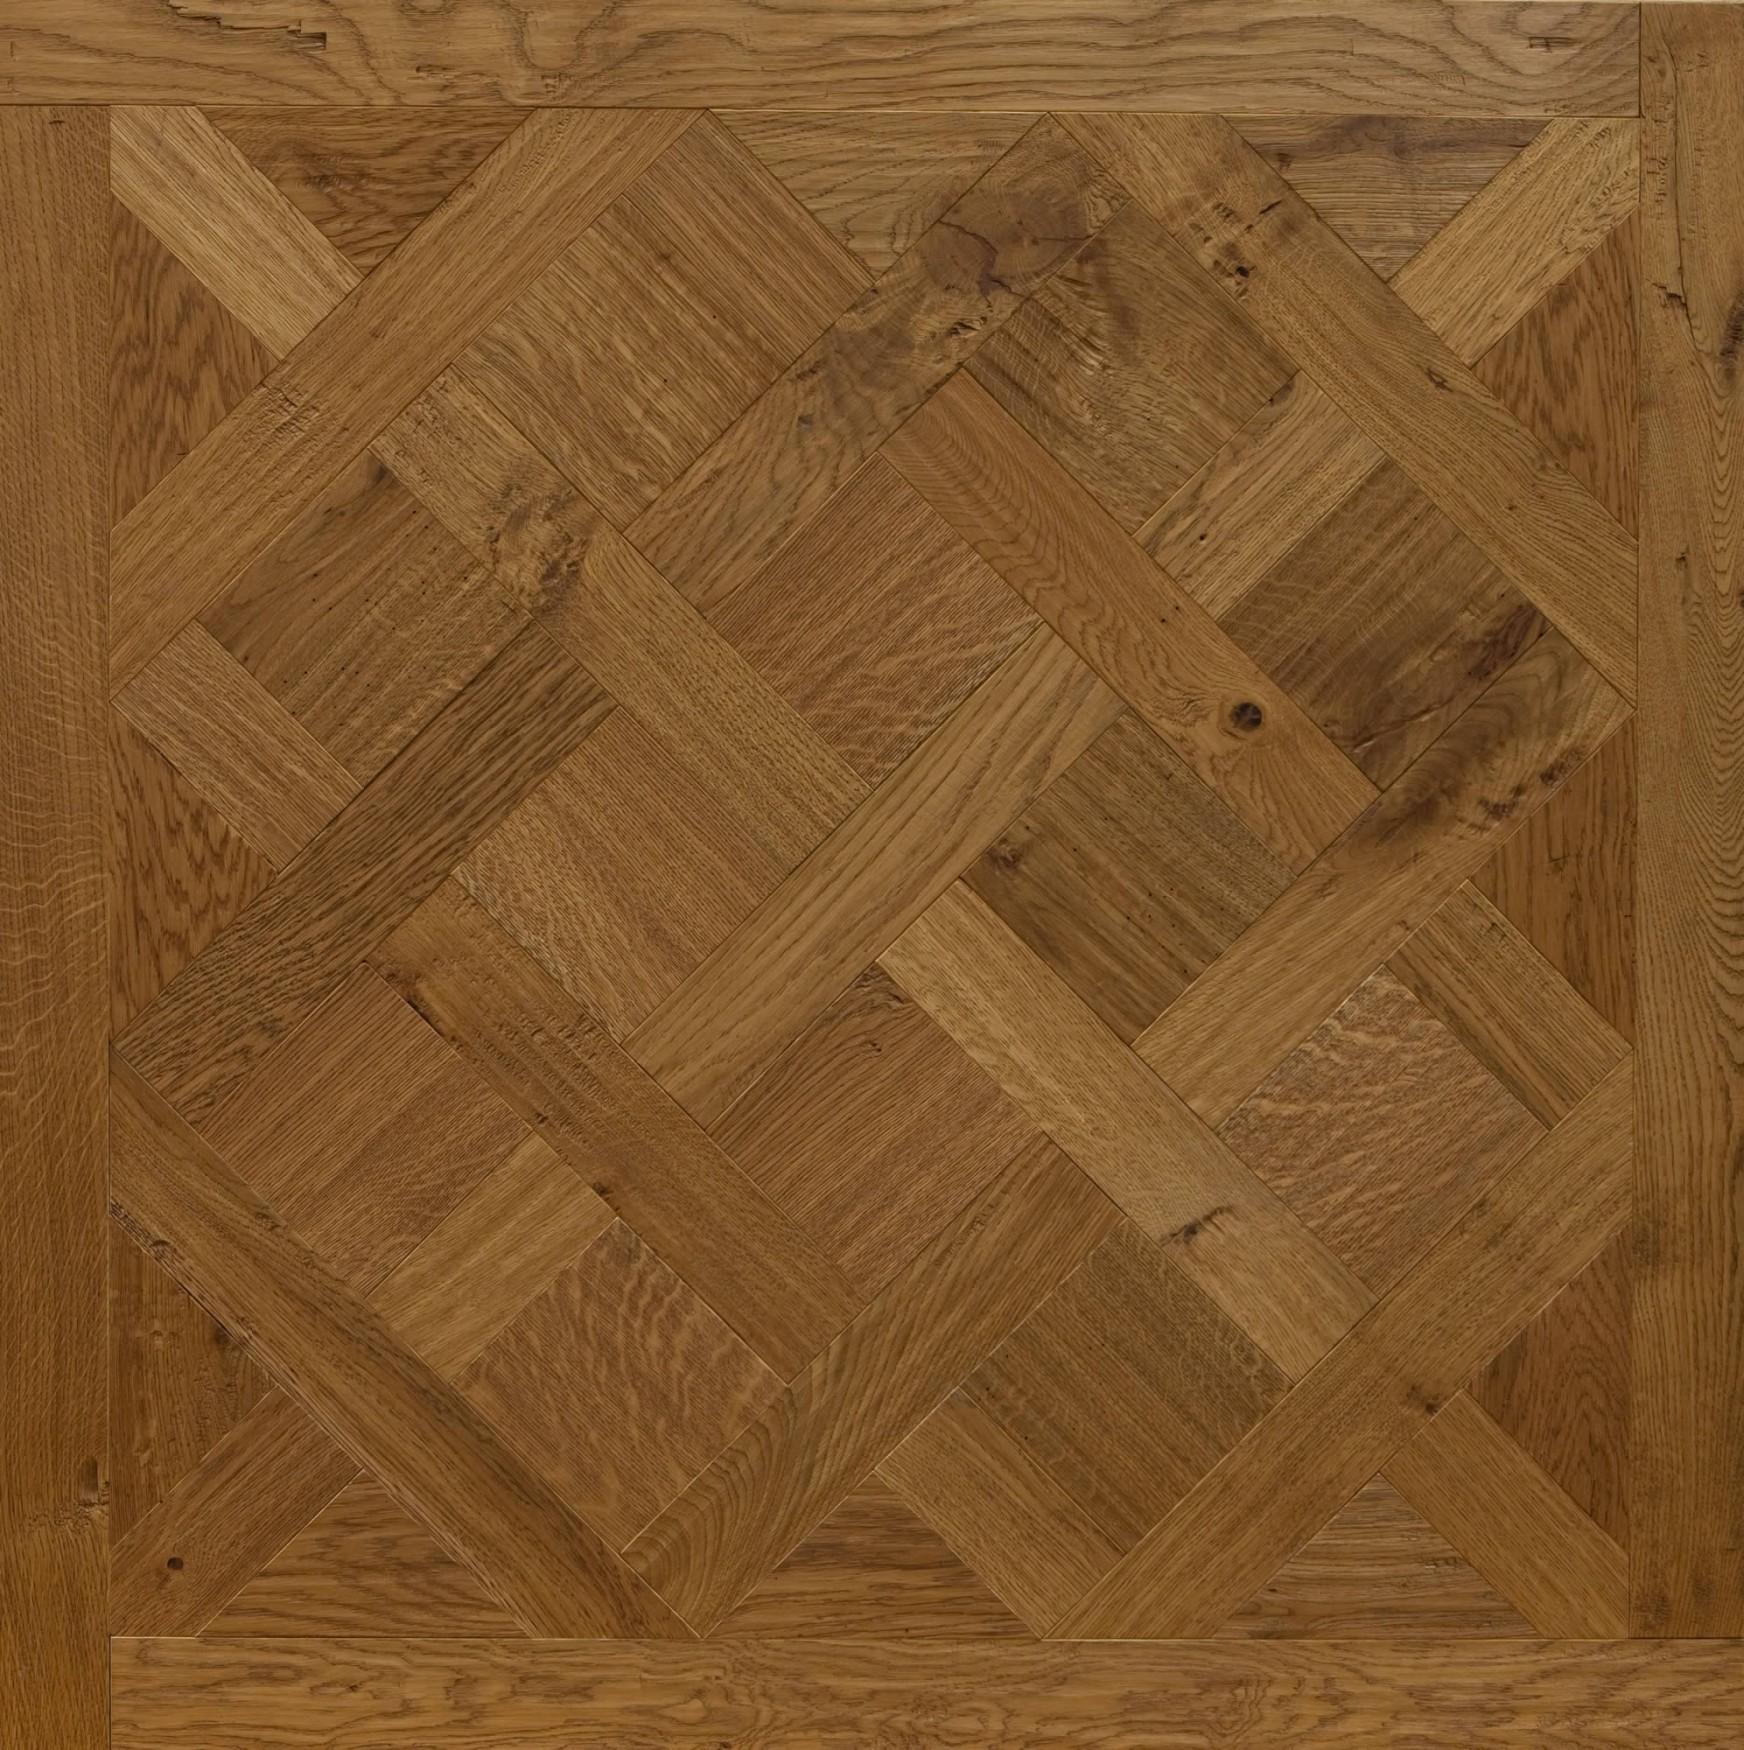 Element7_Textured_oak_versailles_panelIMG_4546